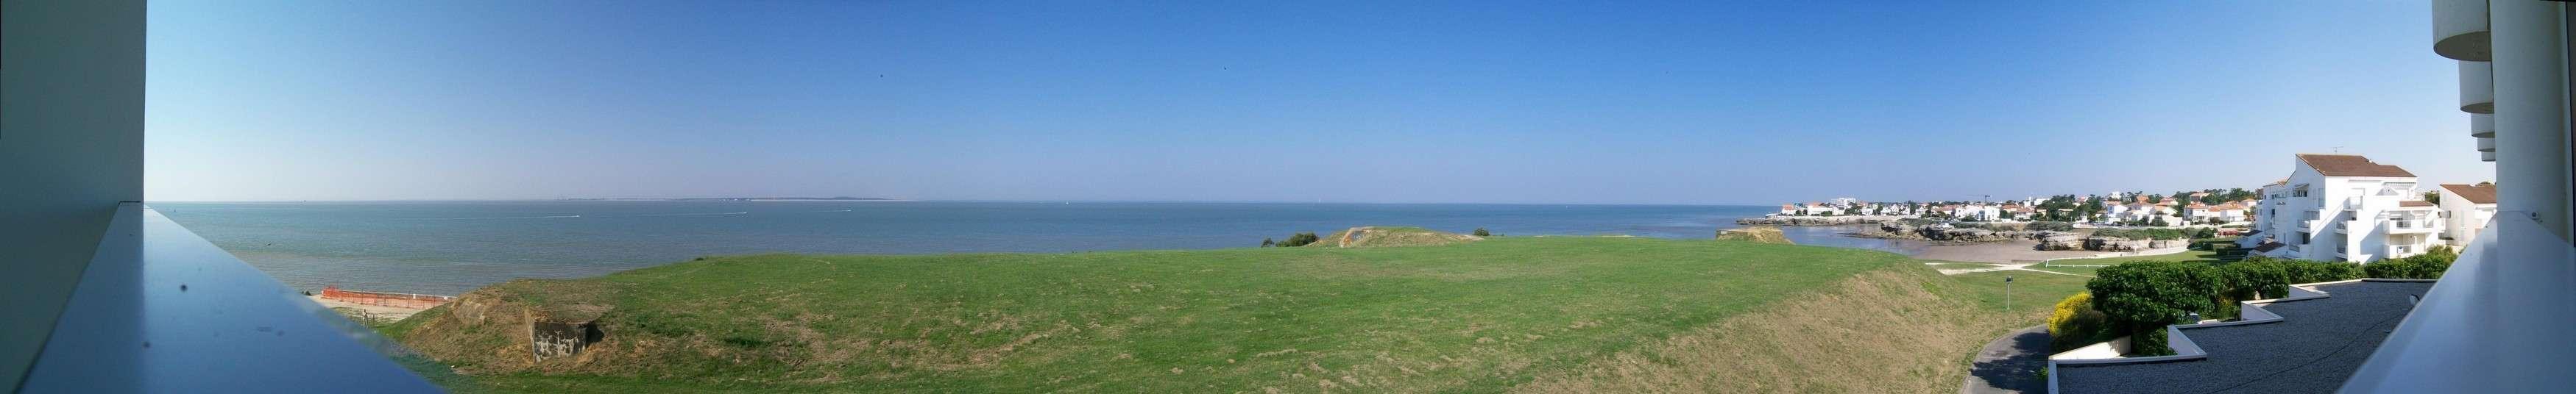 Panorama Royan Pano11